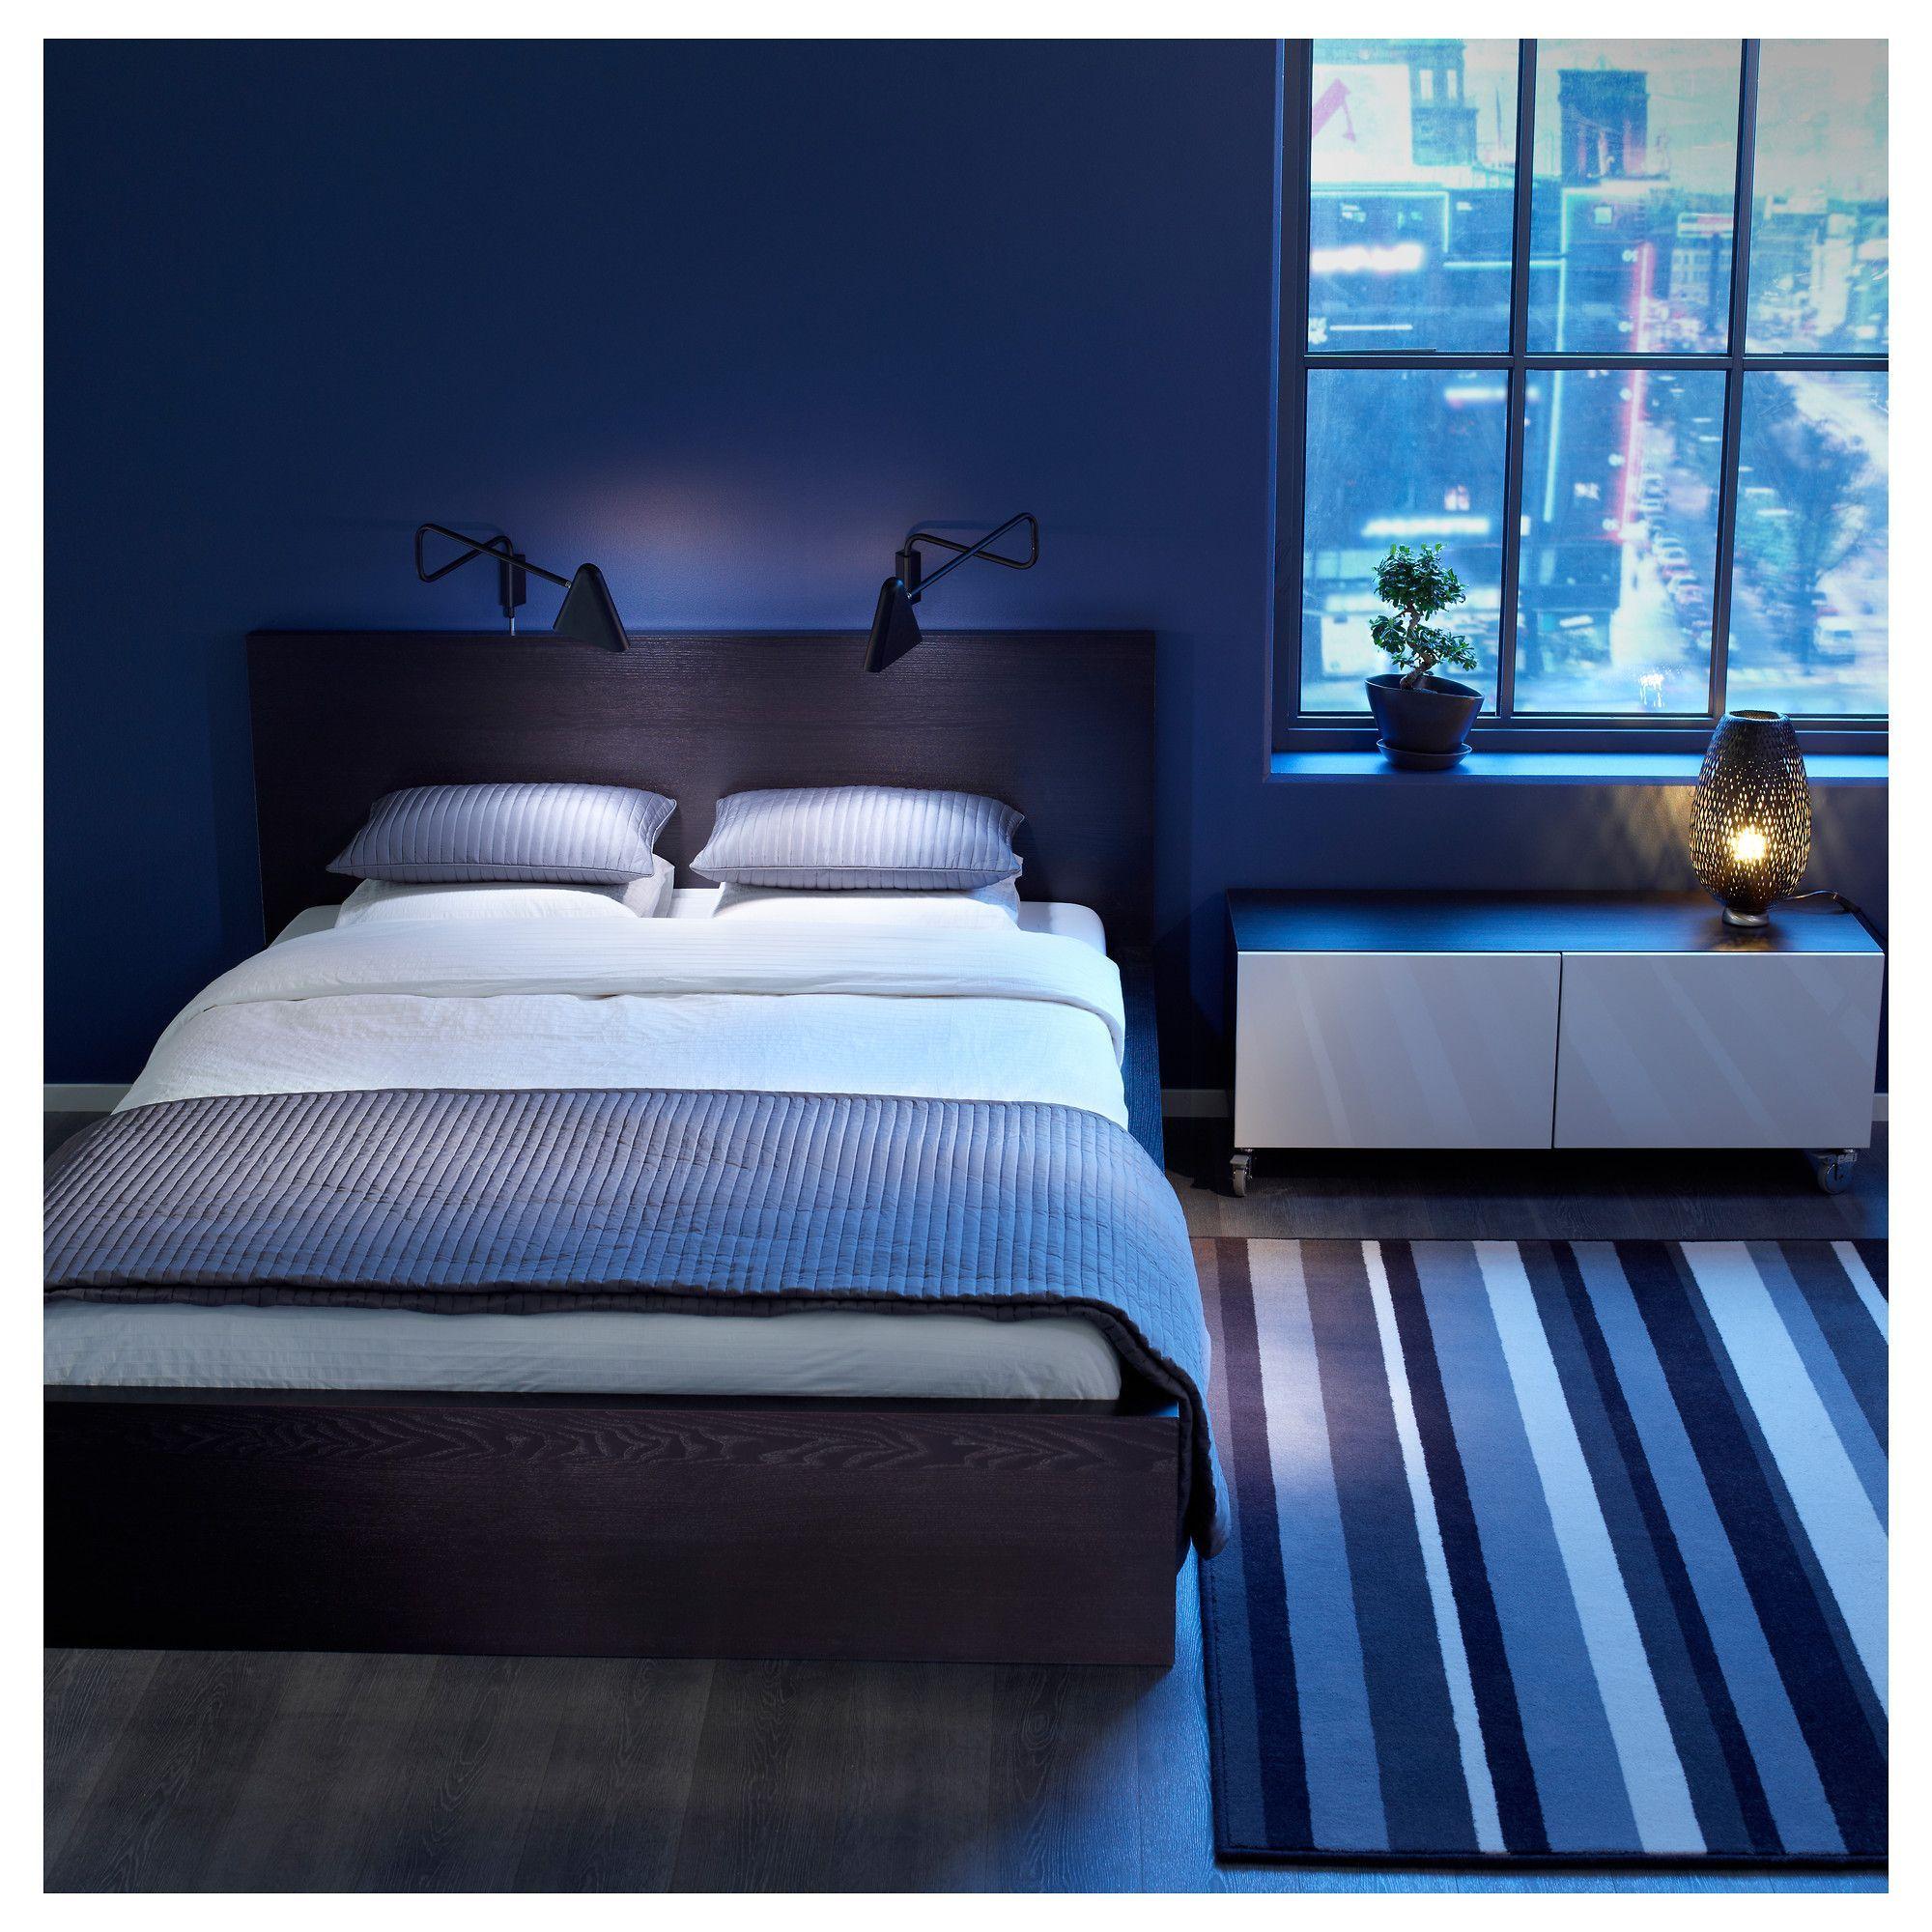 Minimalist Bedroom Mens Small Bedroom Ideas On A Budget - Novocom.top